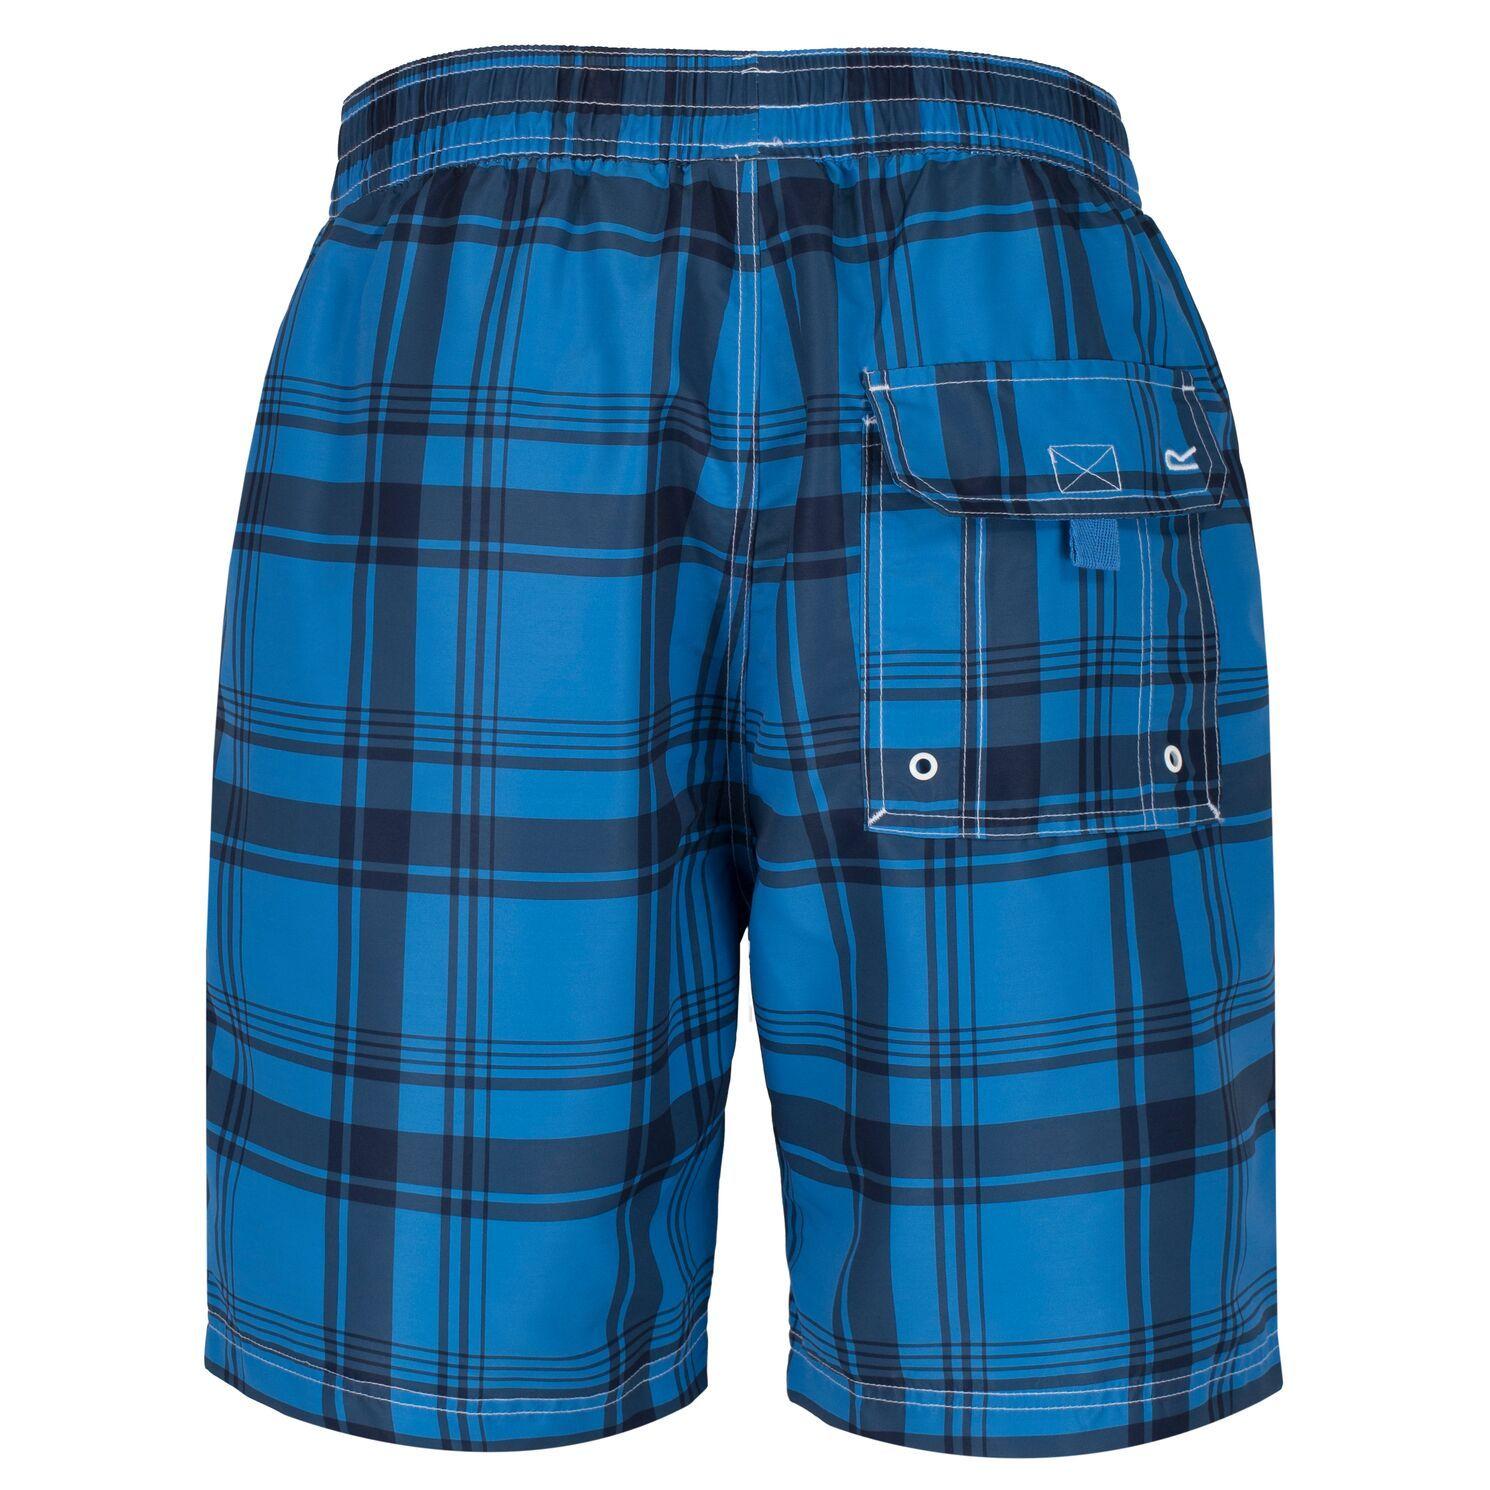 Regatta Great Outdoors Mens Hadden Board Shorts